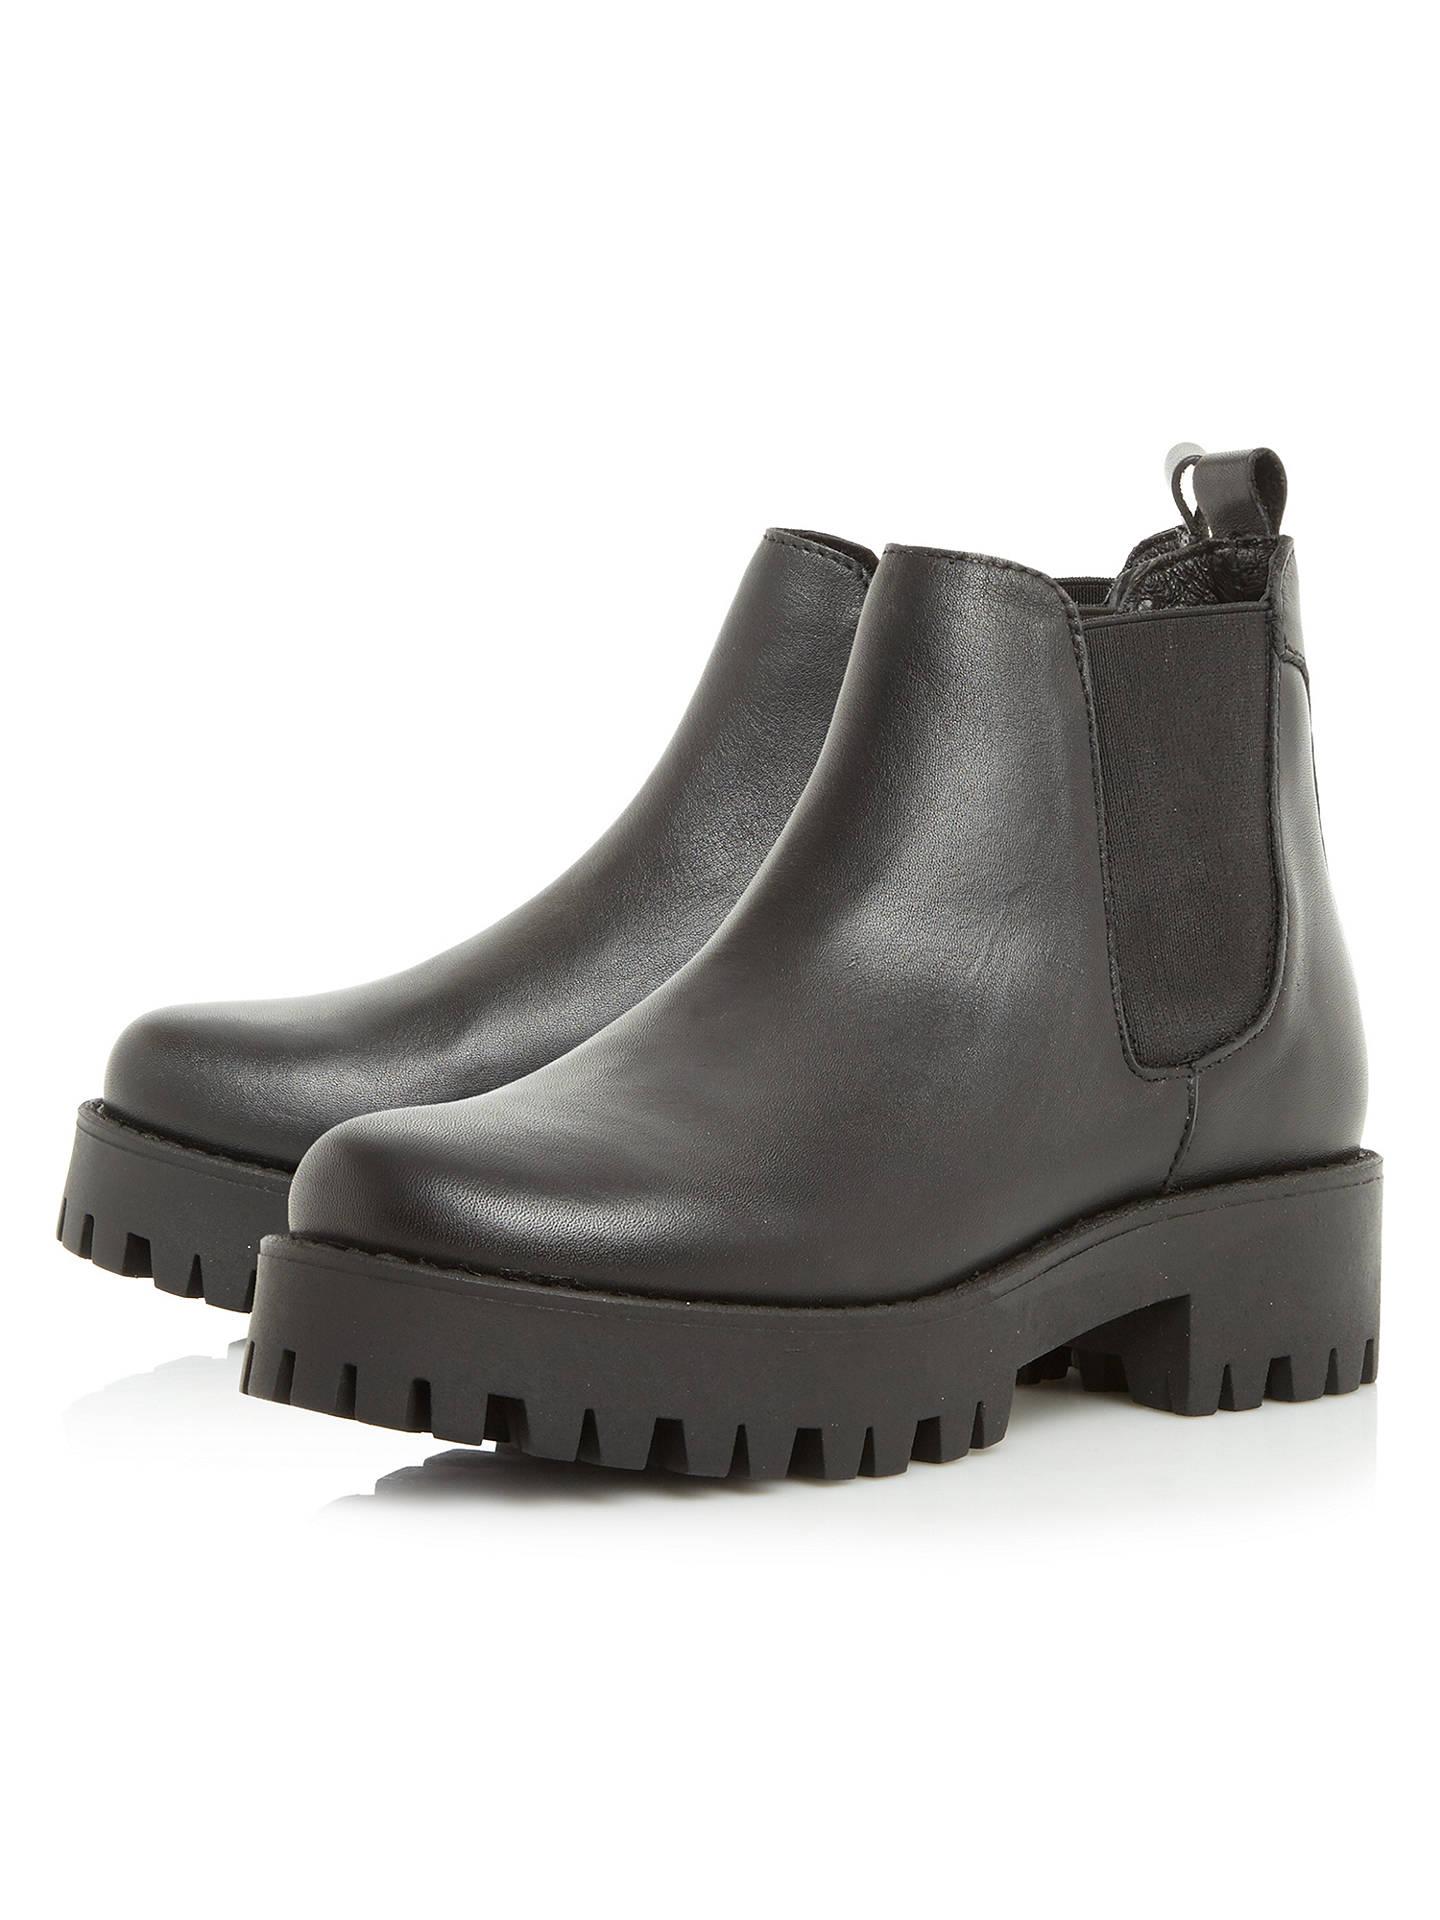 4aa1235aabd ... Buy Steve Madden Bleeker Ankle Chelsea Boots